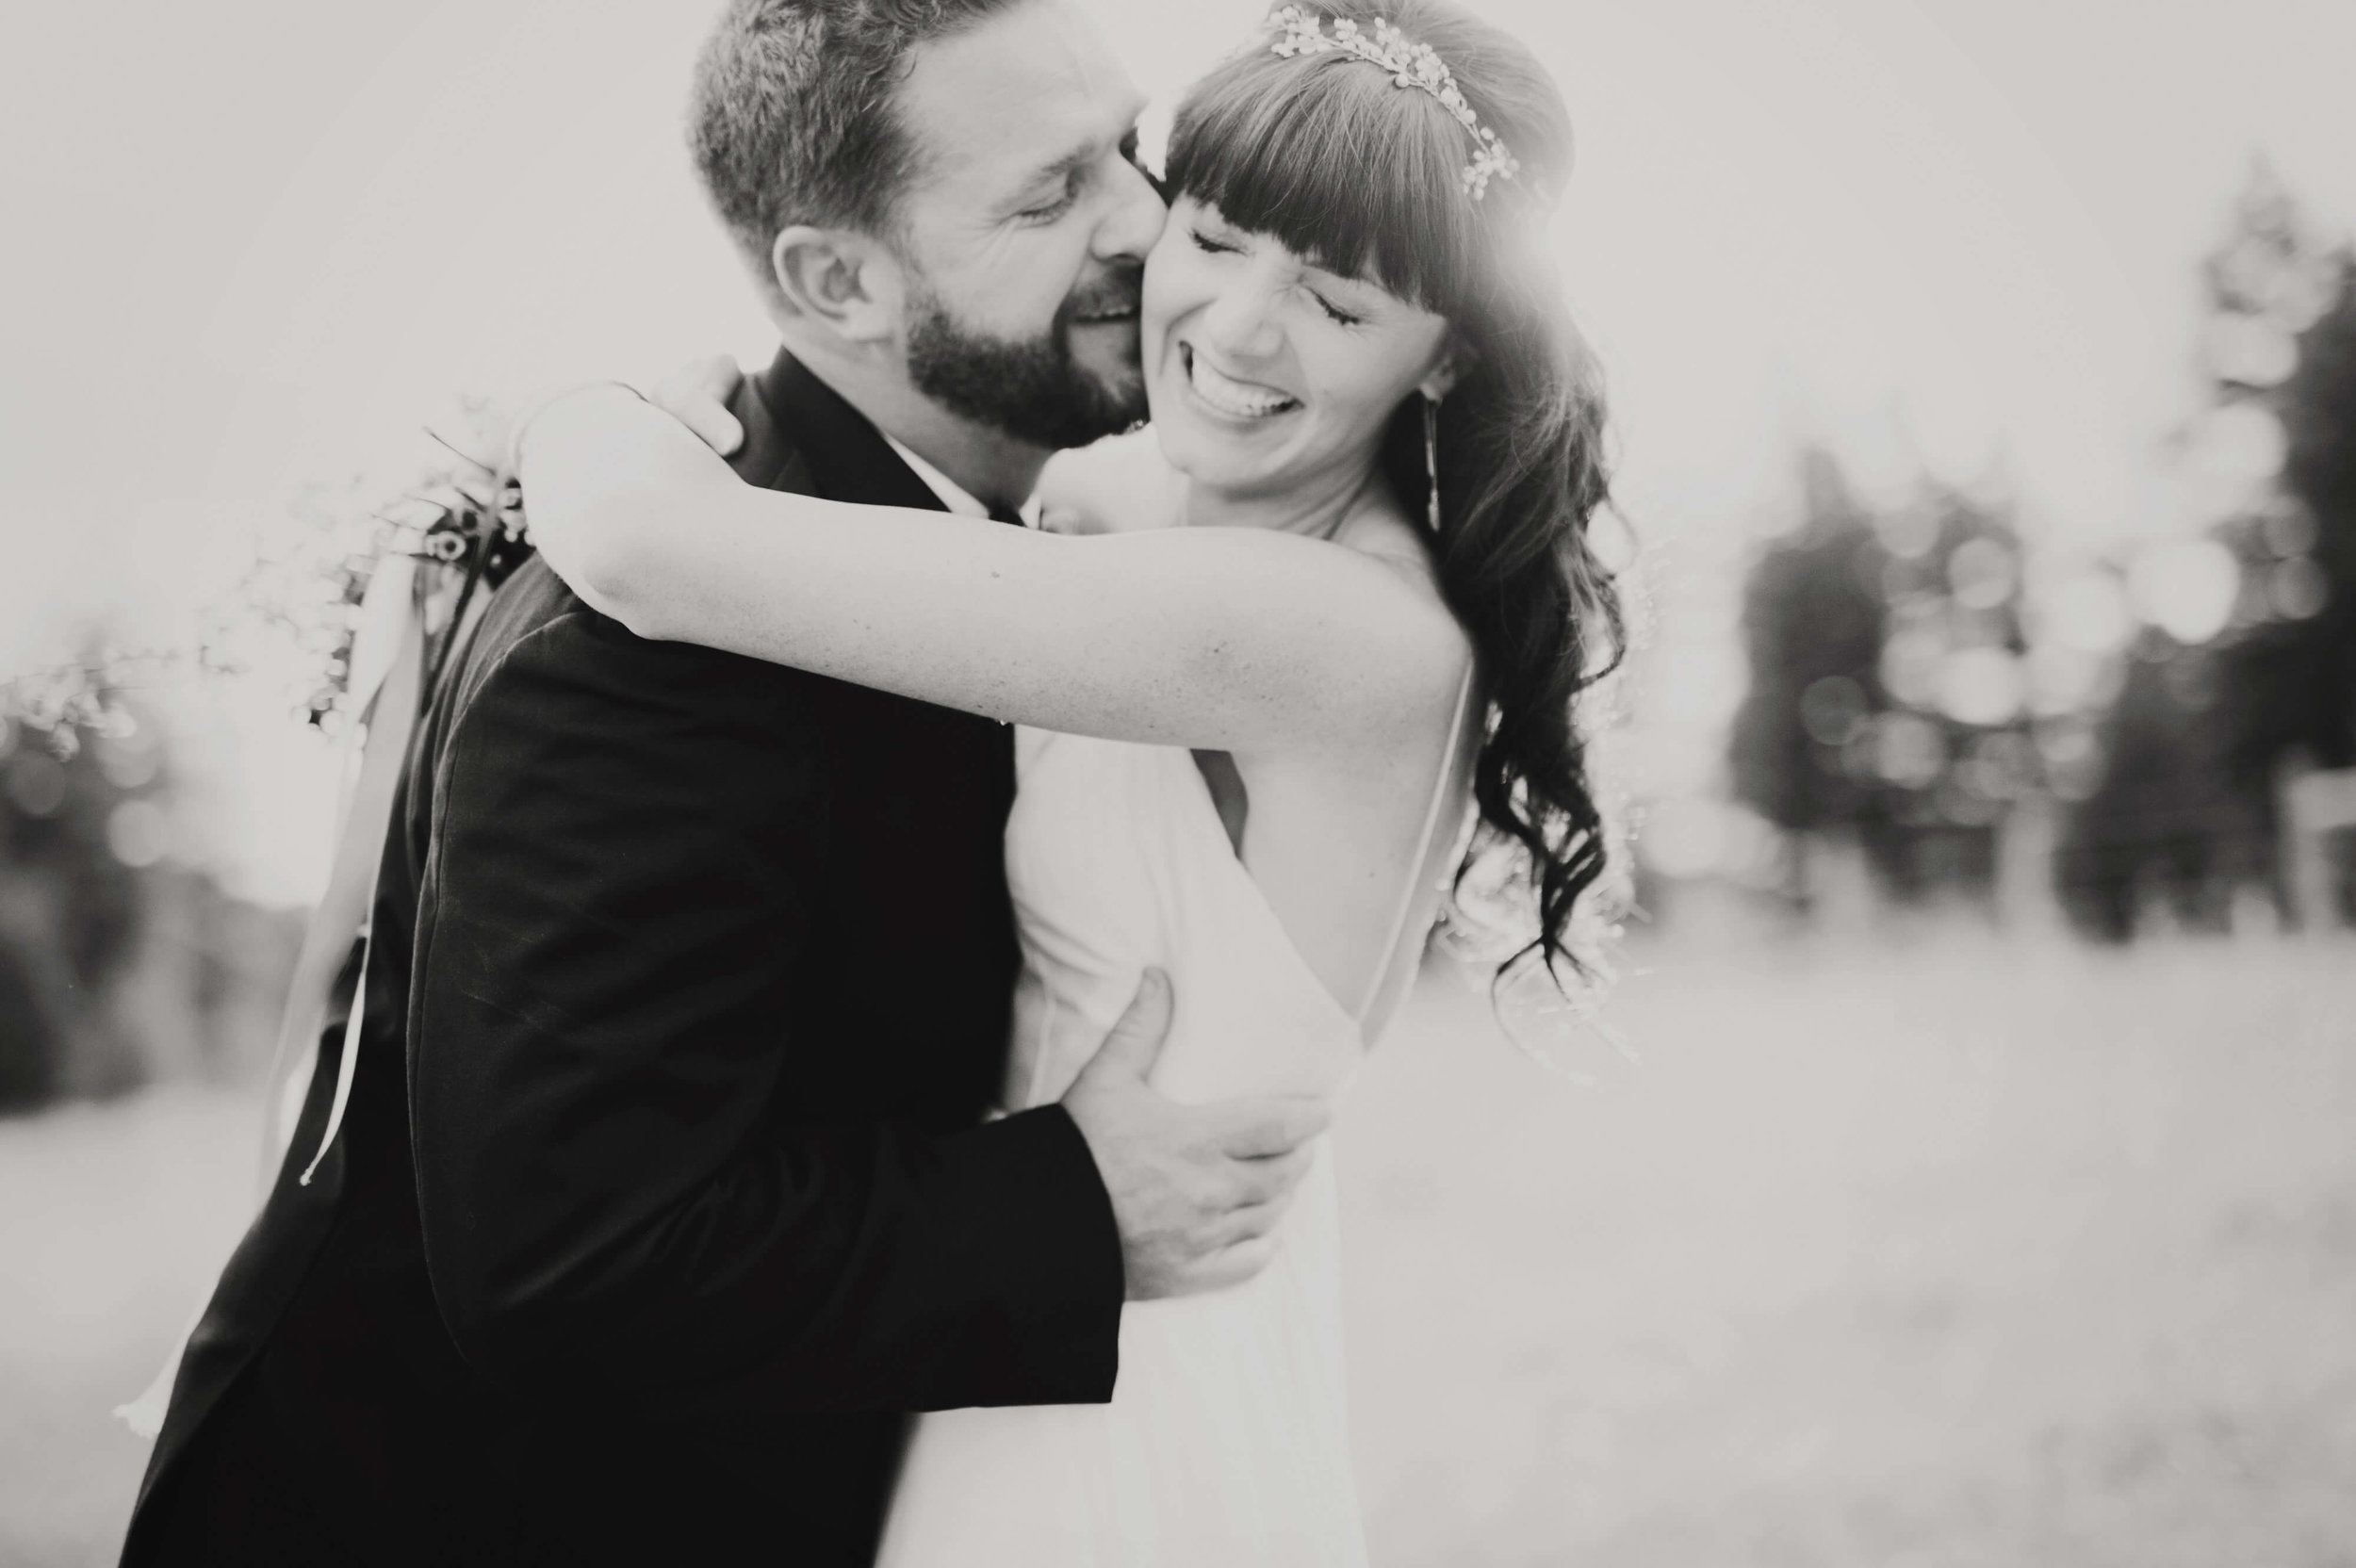 engle-olson-fran-ze-photo-montana-wedding-110.jpg